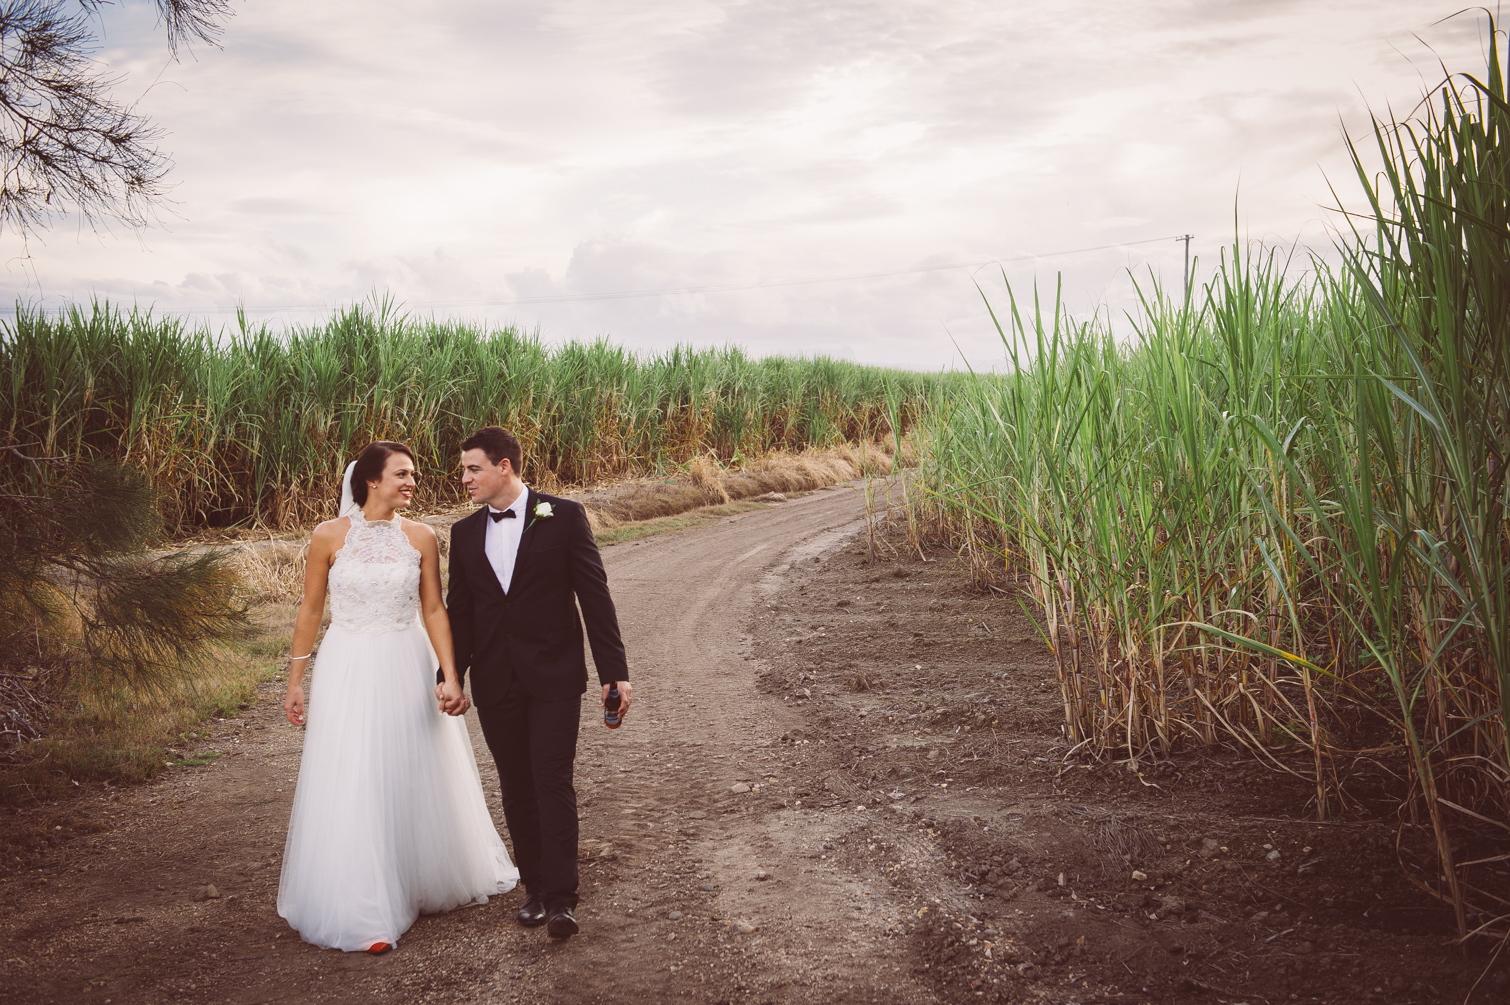 Osteria wedding_New Black Studios 47.jpg